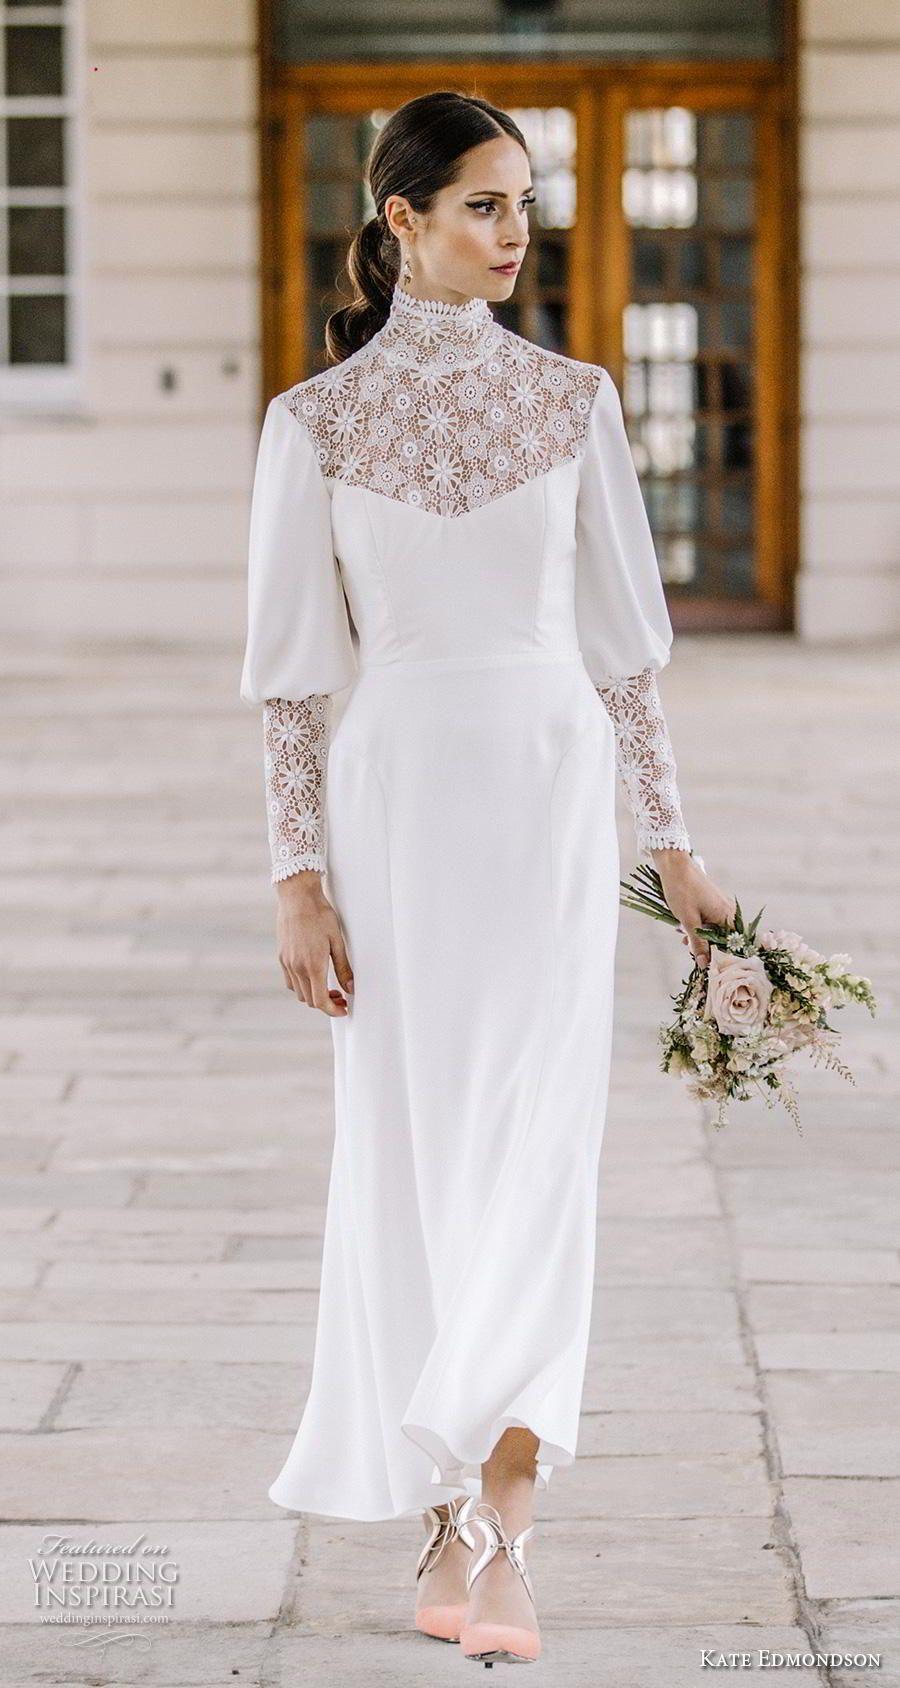 Kate Edmondson Couture Wedding Dresses Wedding Inspirasi Wedding Dress Couture Wedding Dresses High Neck Lace Wedding Dress [ 1688 x 900 Pixel ]